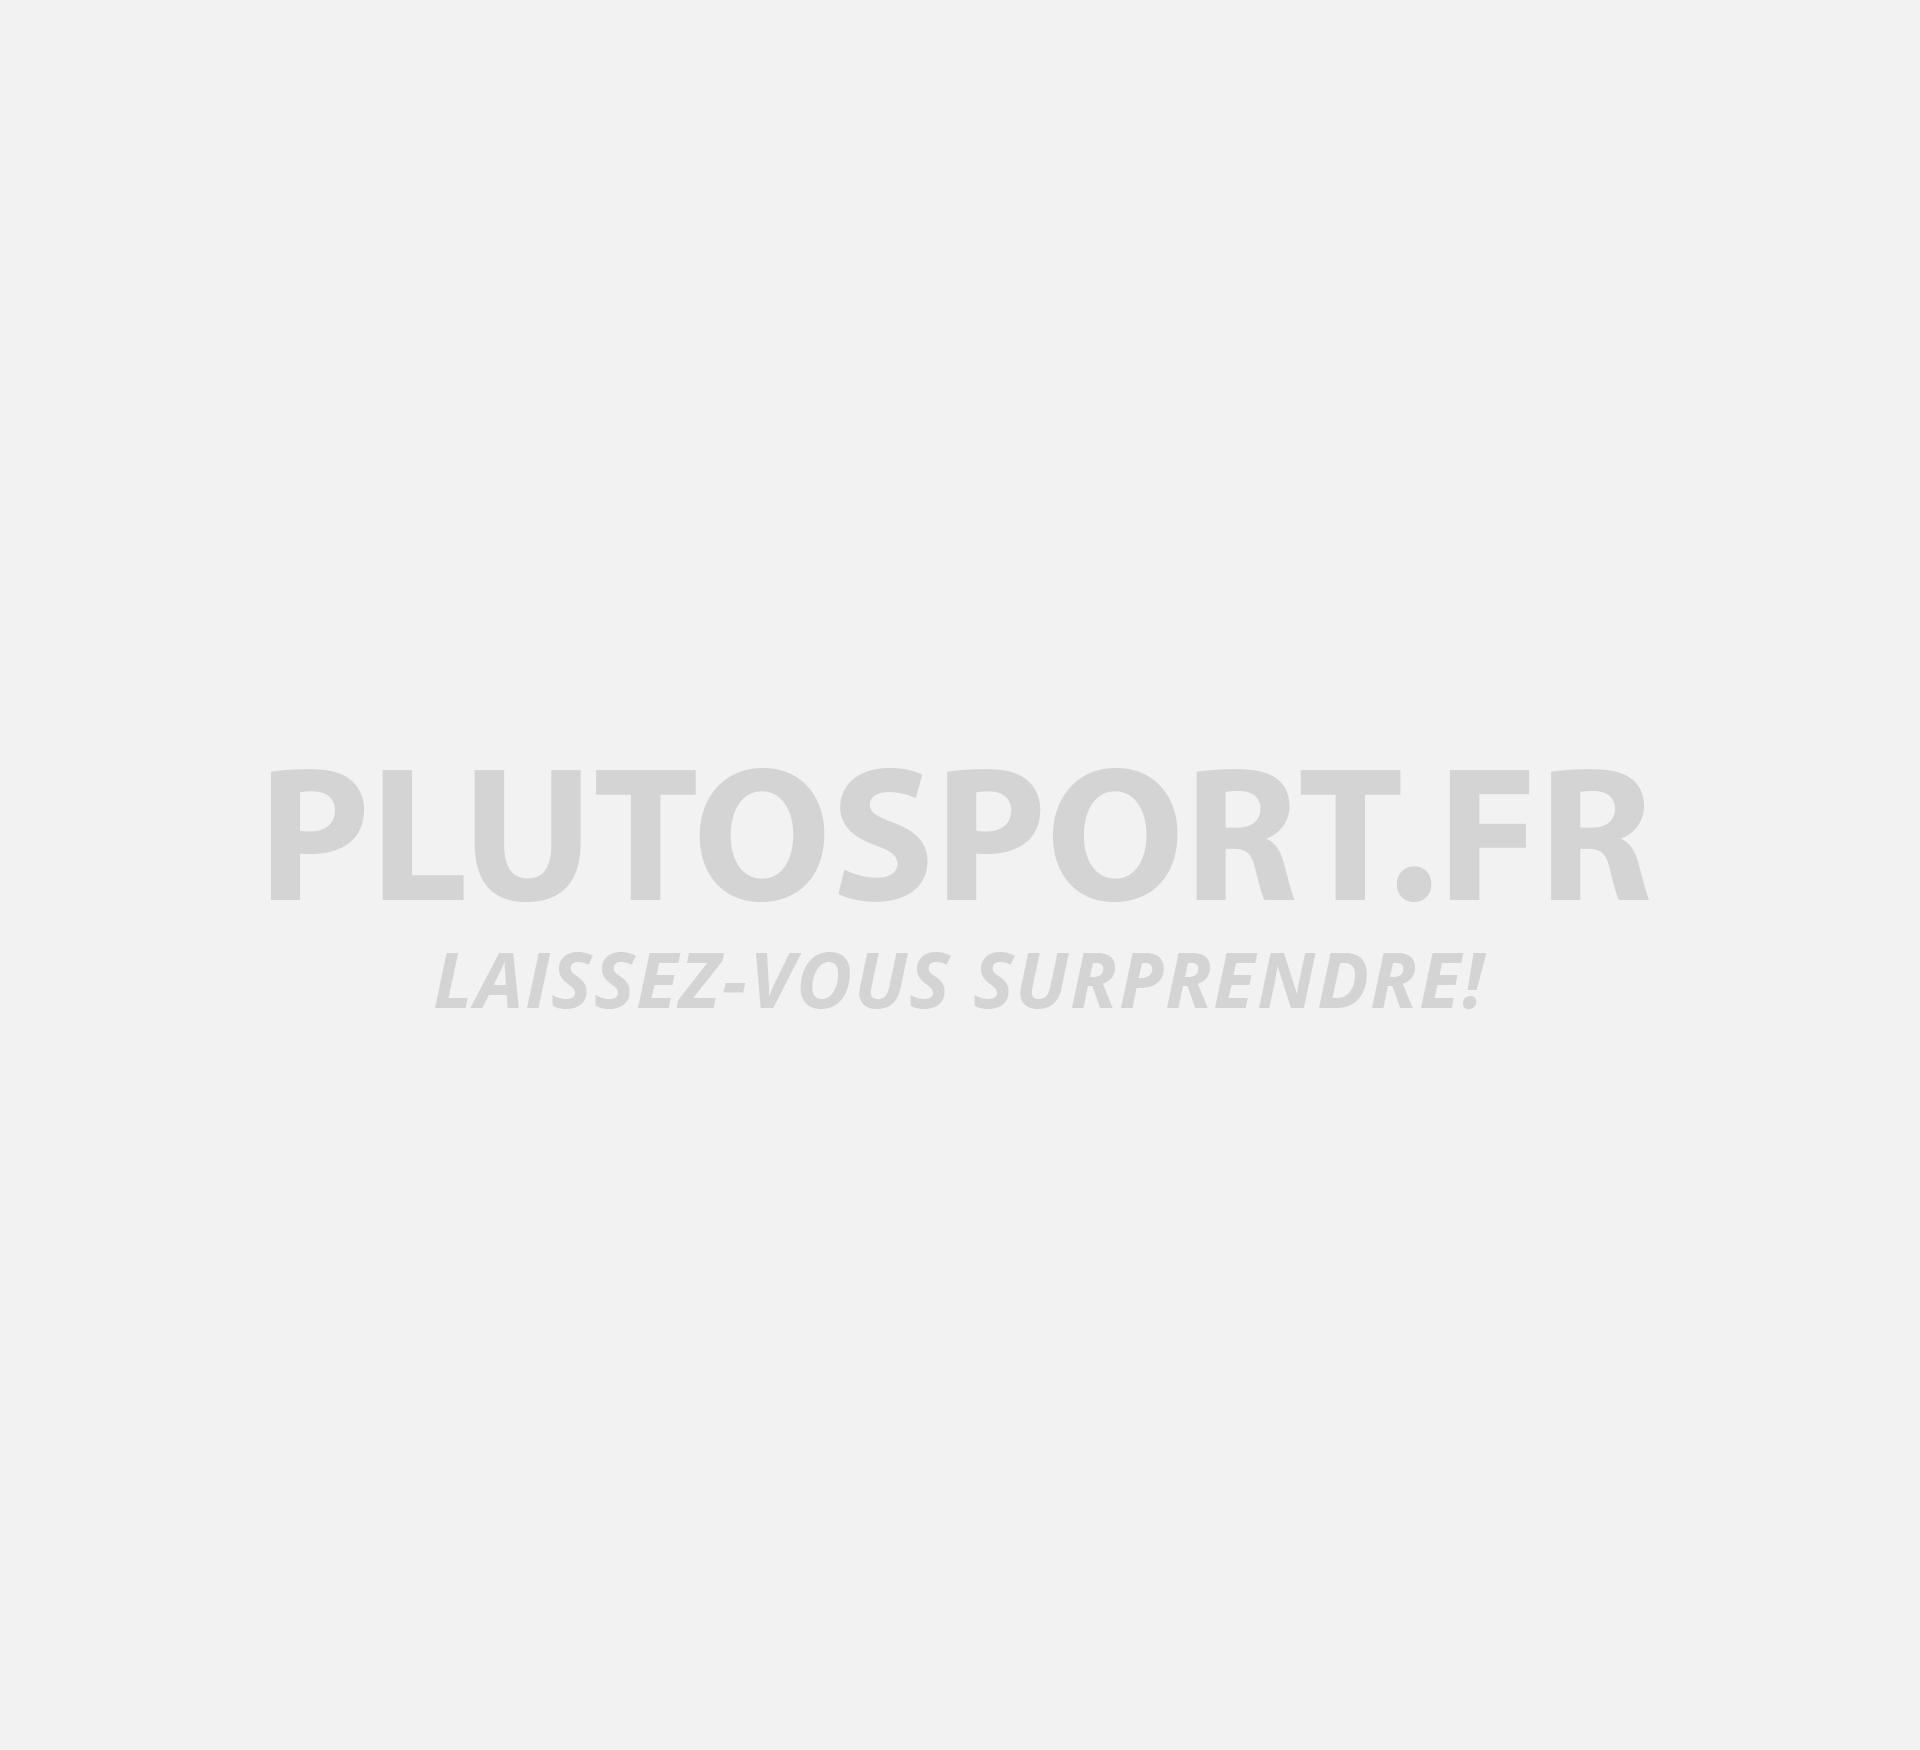 Sac de sport Under Armour Undeniable Duffel 4.0 ( Petite taille)